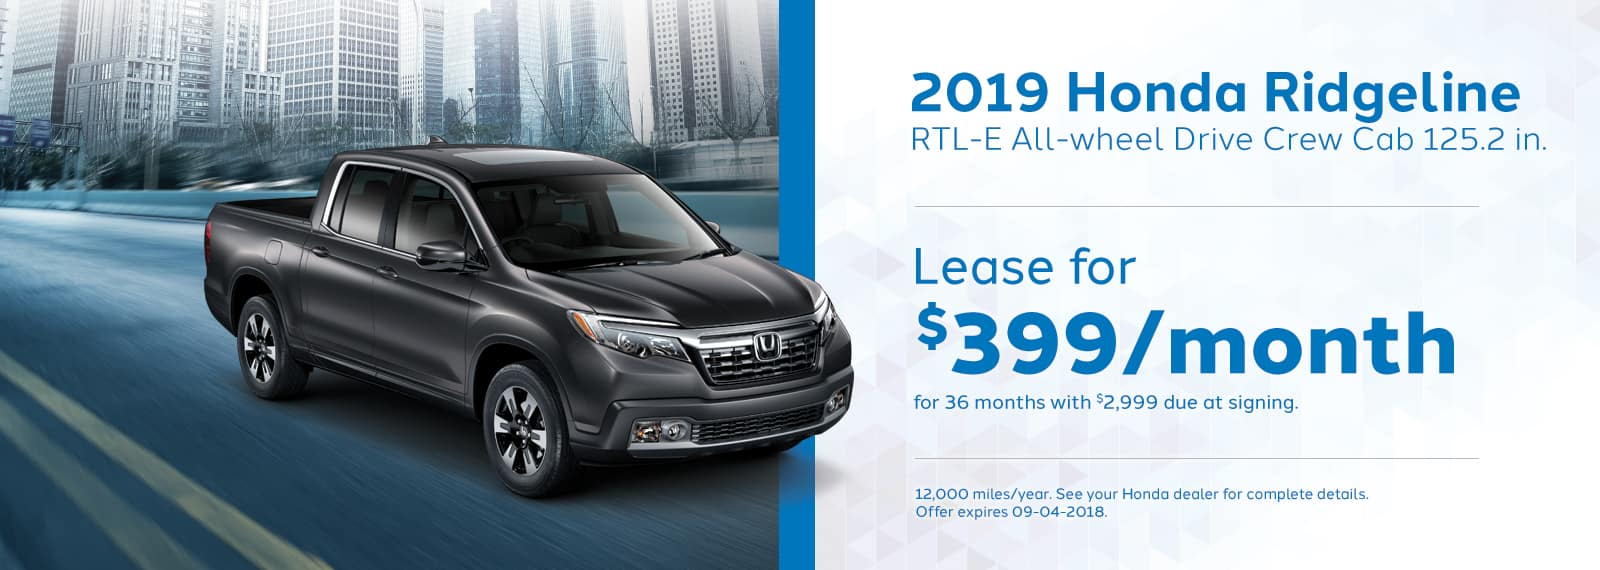 Ridgeline Genthe Honda Lease special